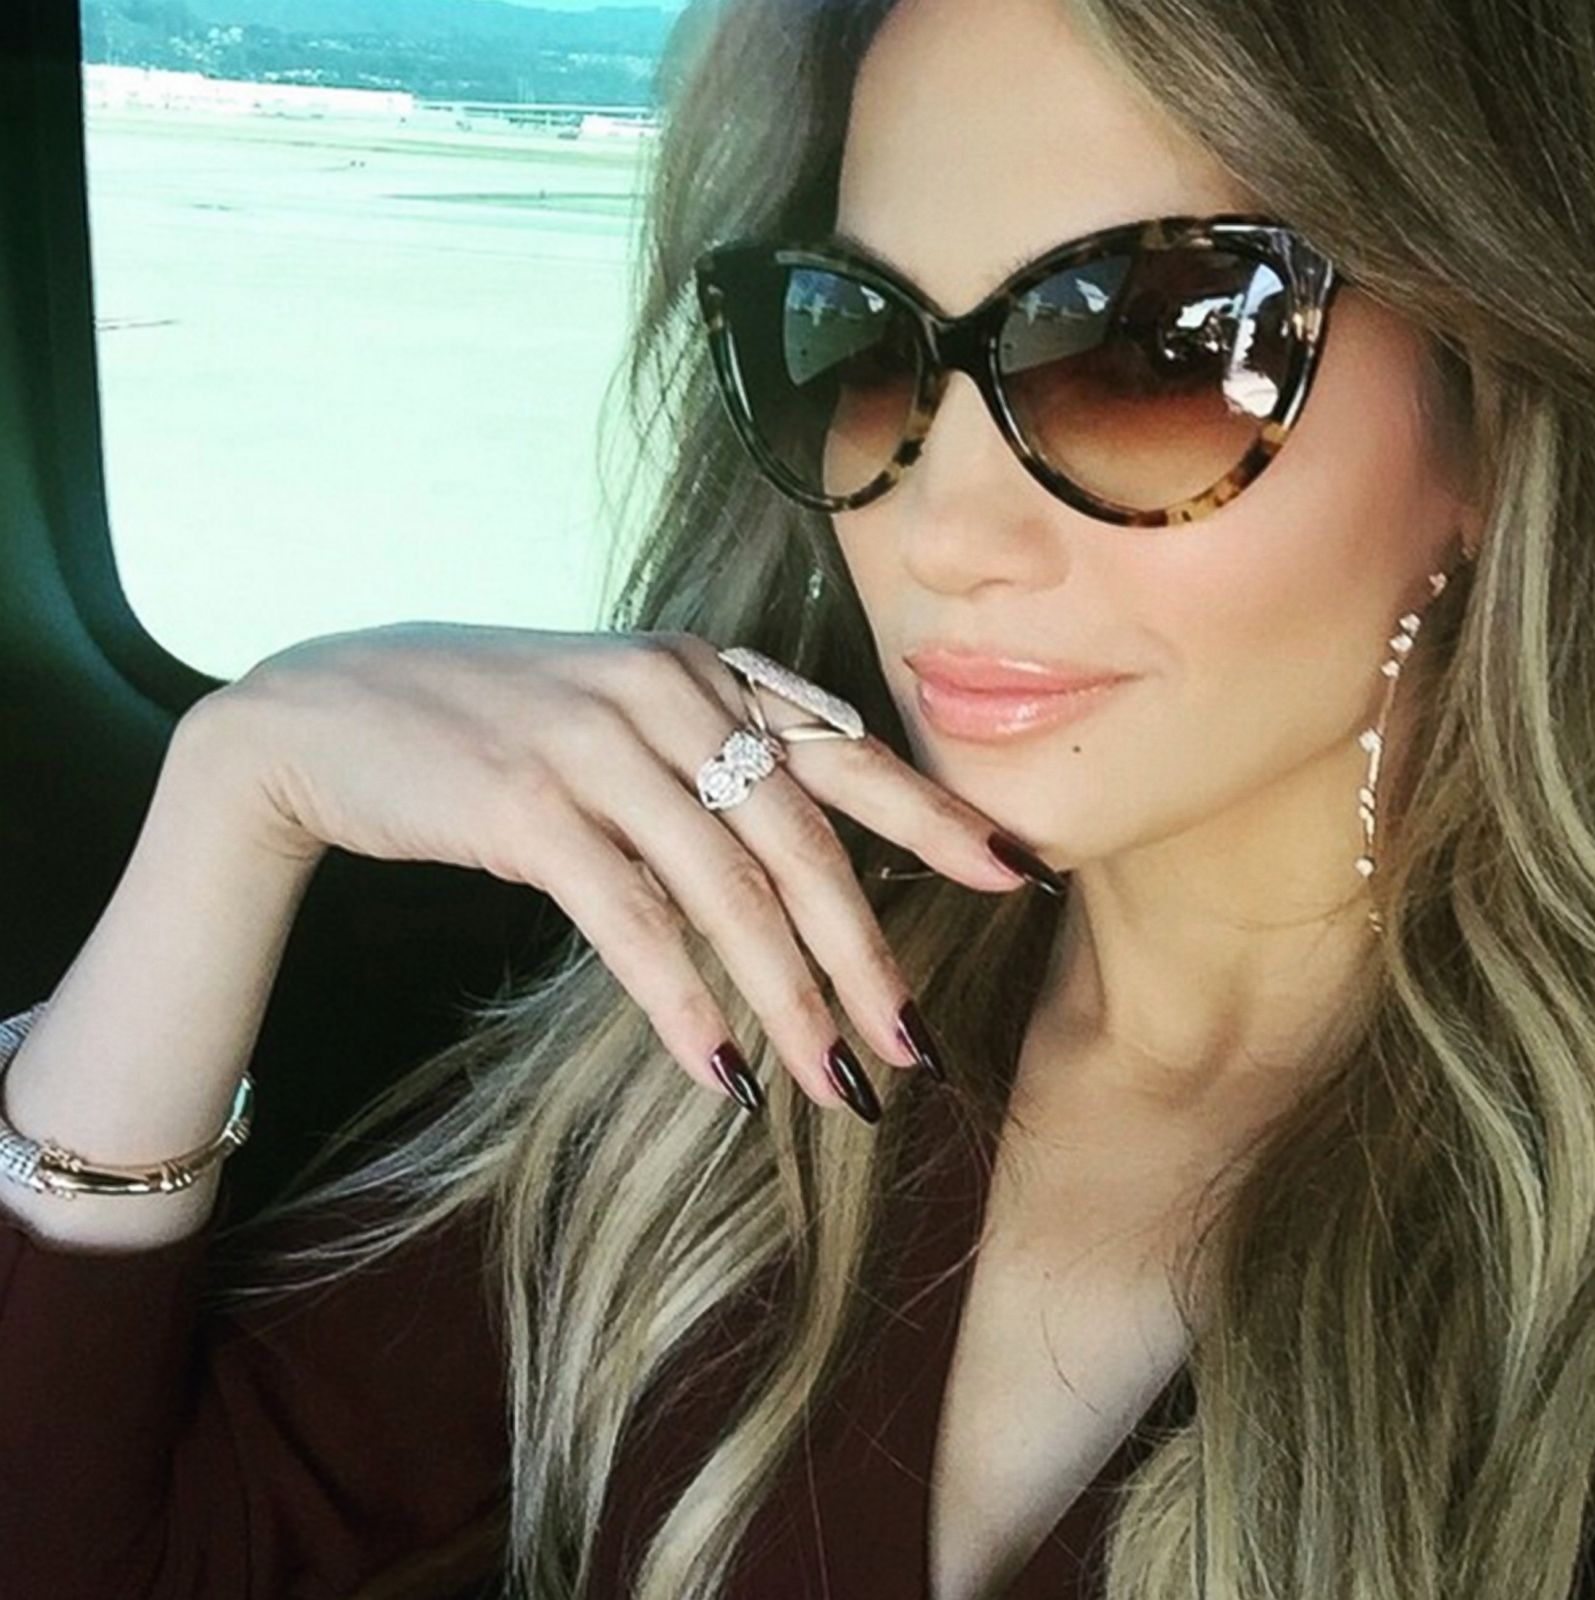 Selfie Jennifer Lopeza nude (26 photo), Tits, Sideboobs, Boobs, braless 2017